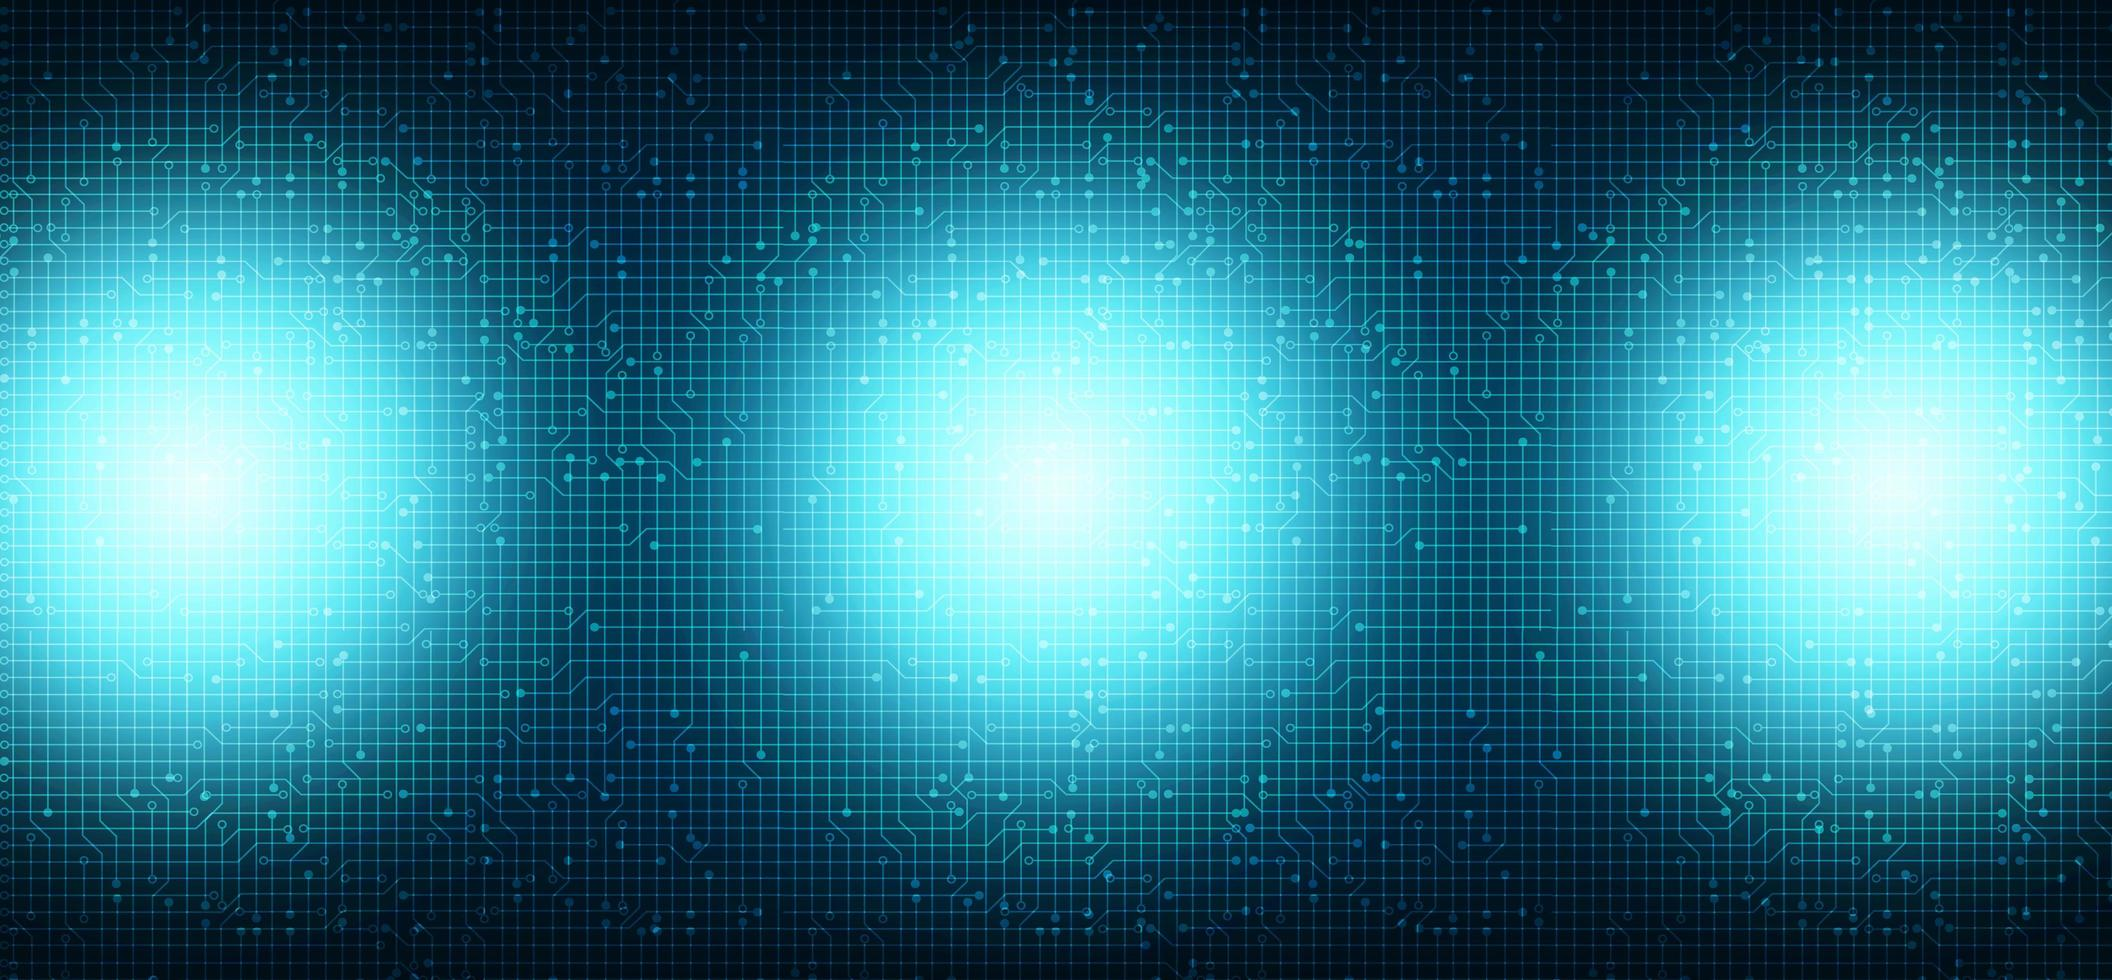 luz azul no fundo de tecnologia vetor